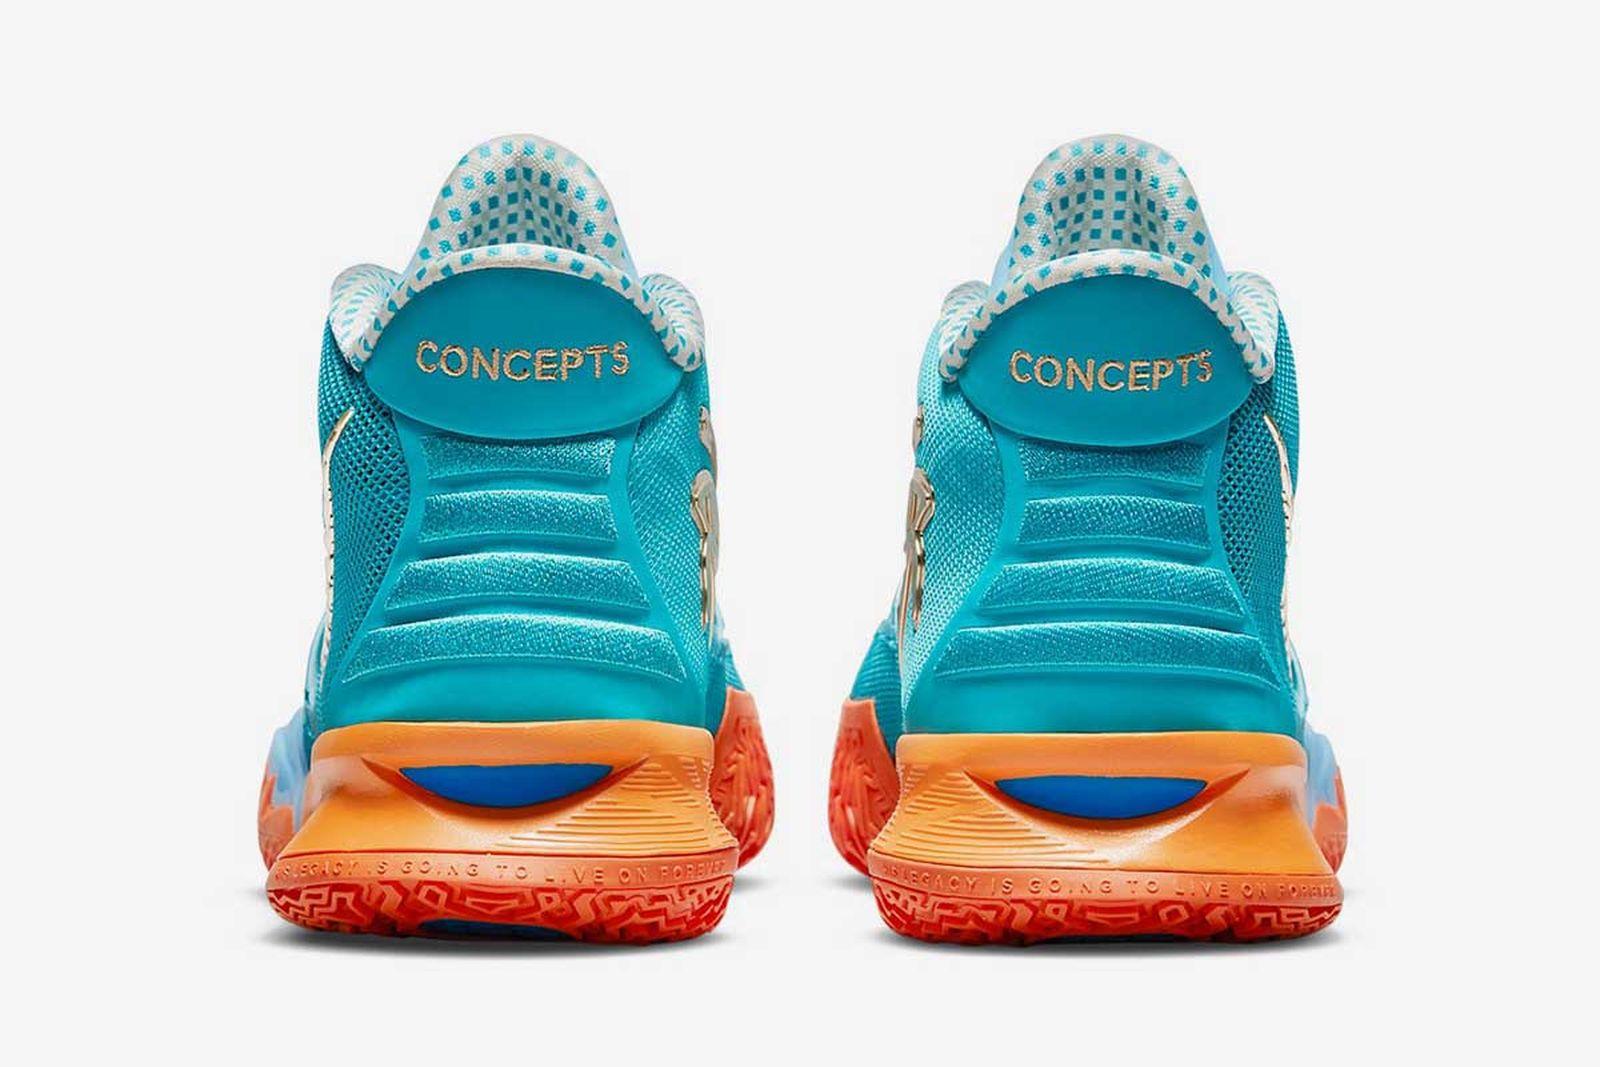 sneaker-news-02-25-2021-1-05